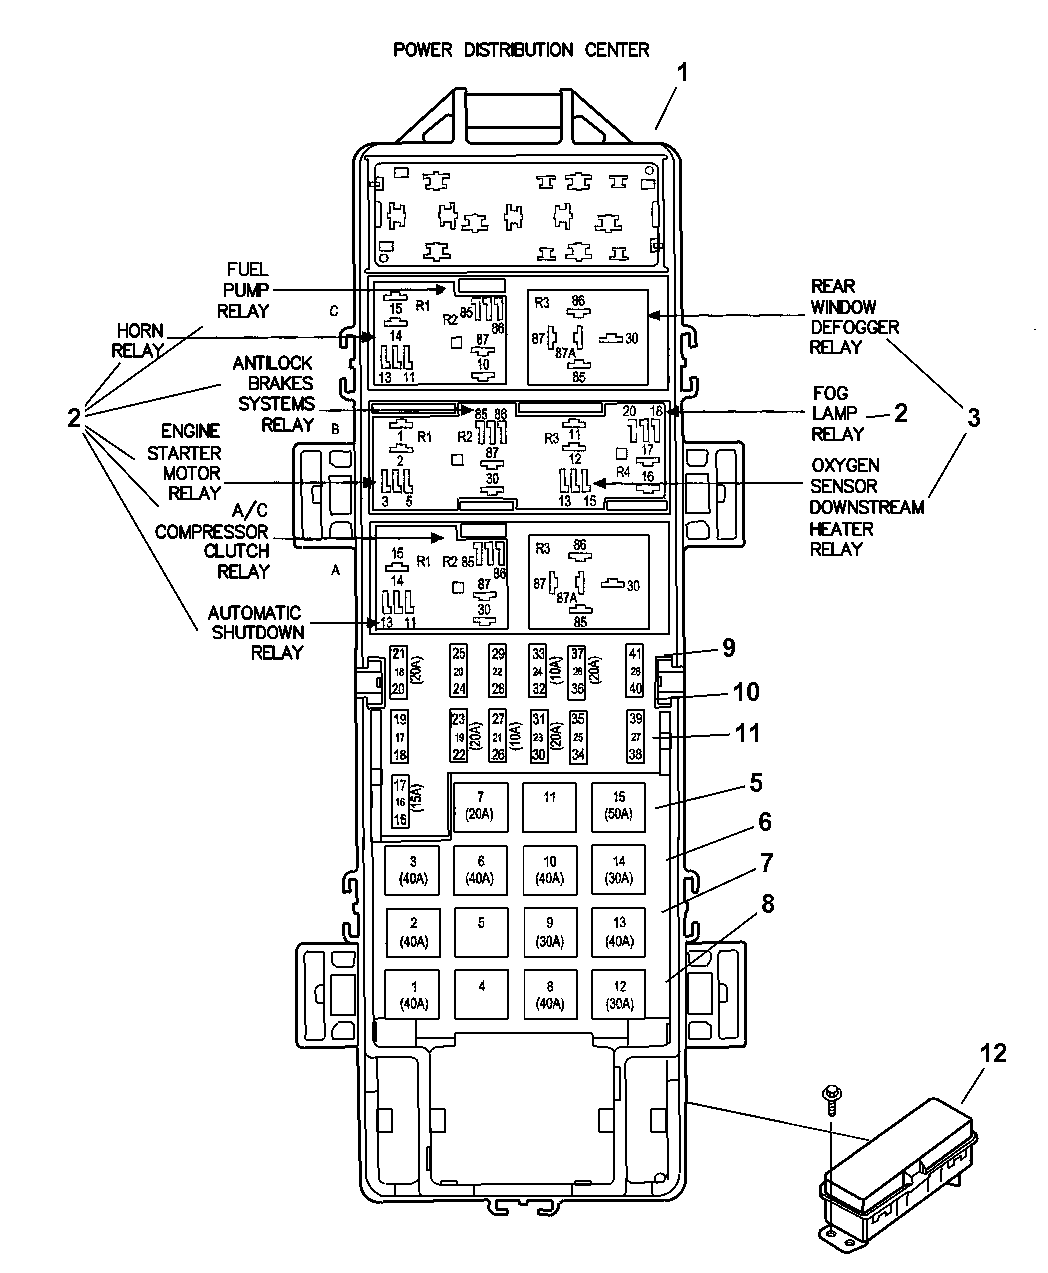 96 Jeep Wrangler Fuse Diagram